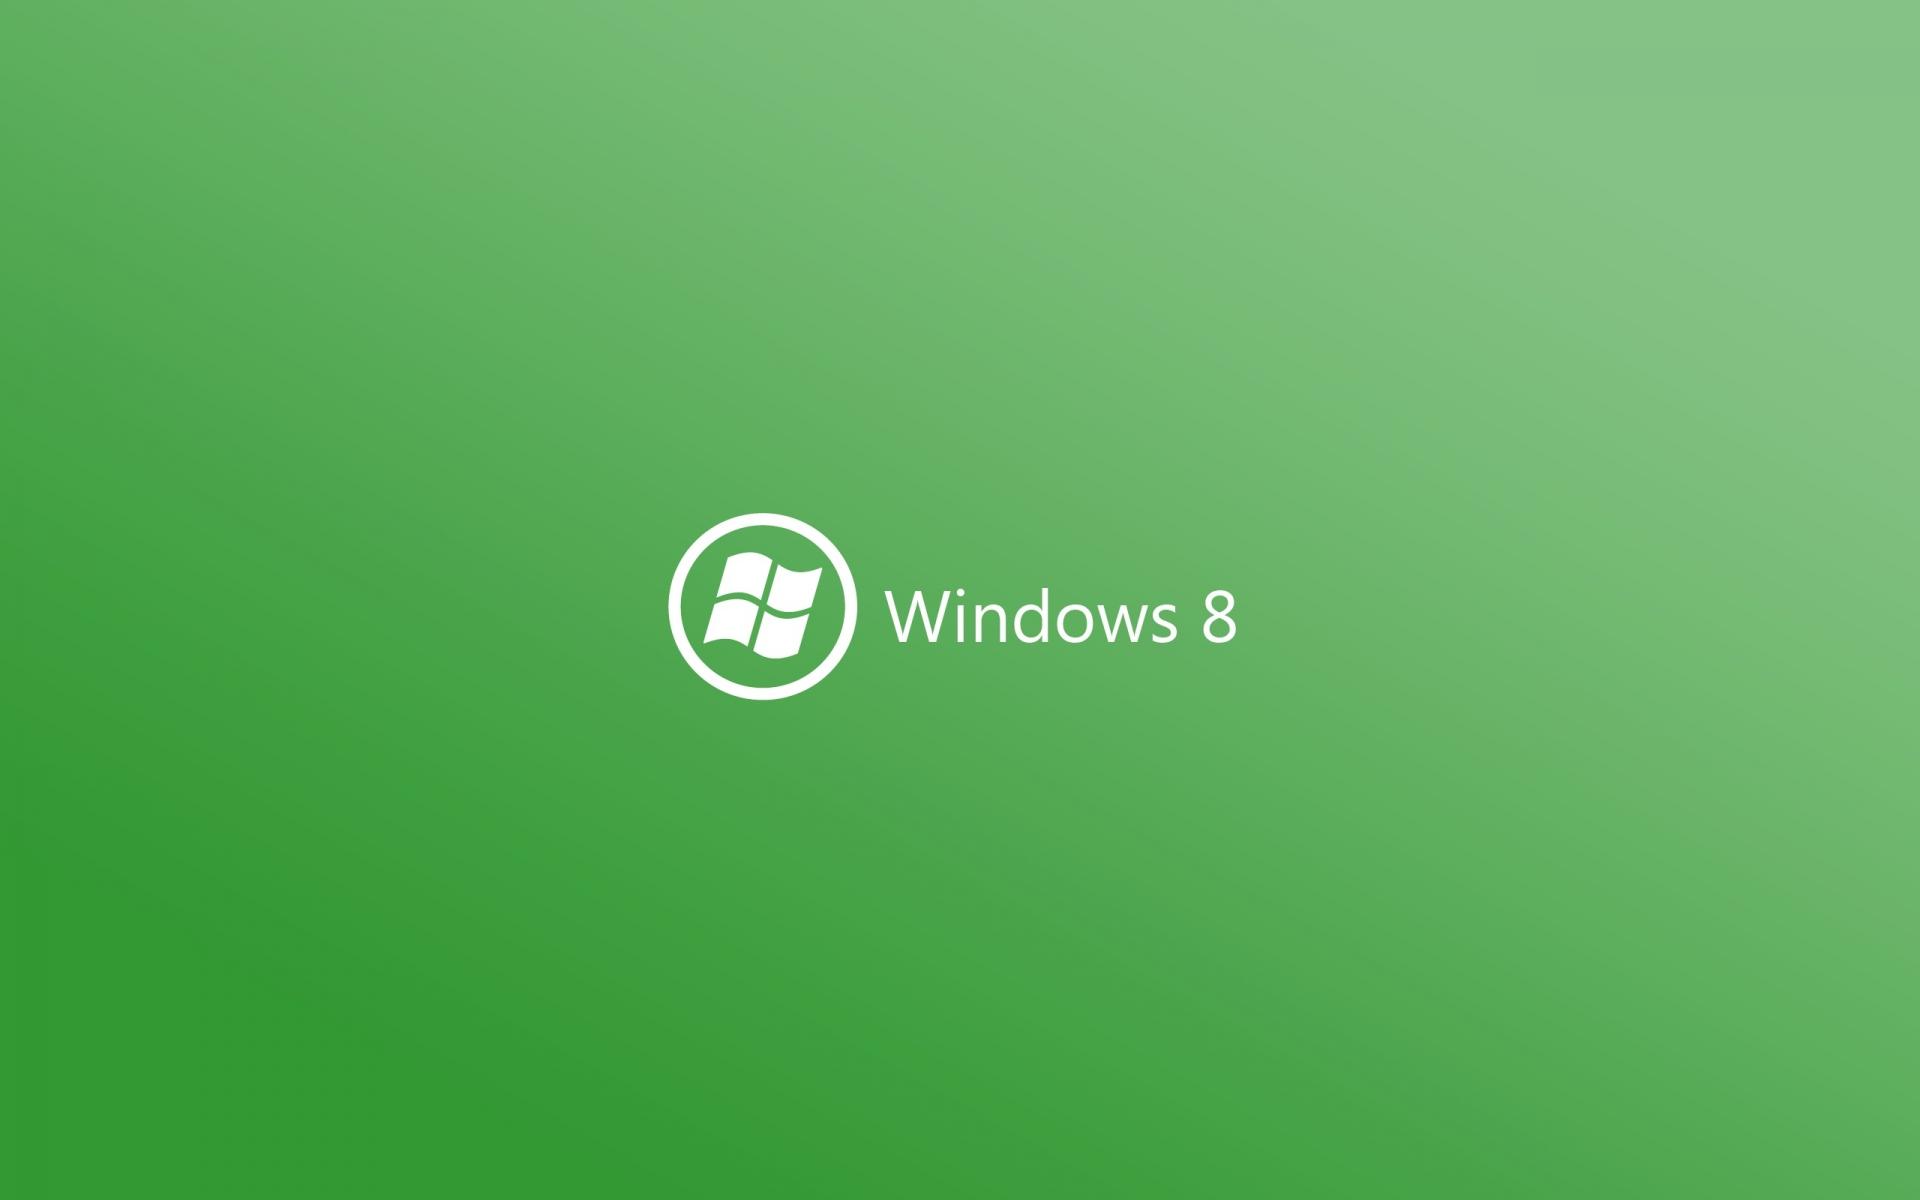 Windows 8 verde - 1920x1200